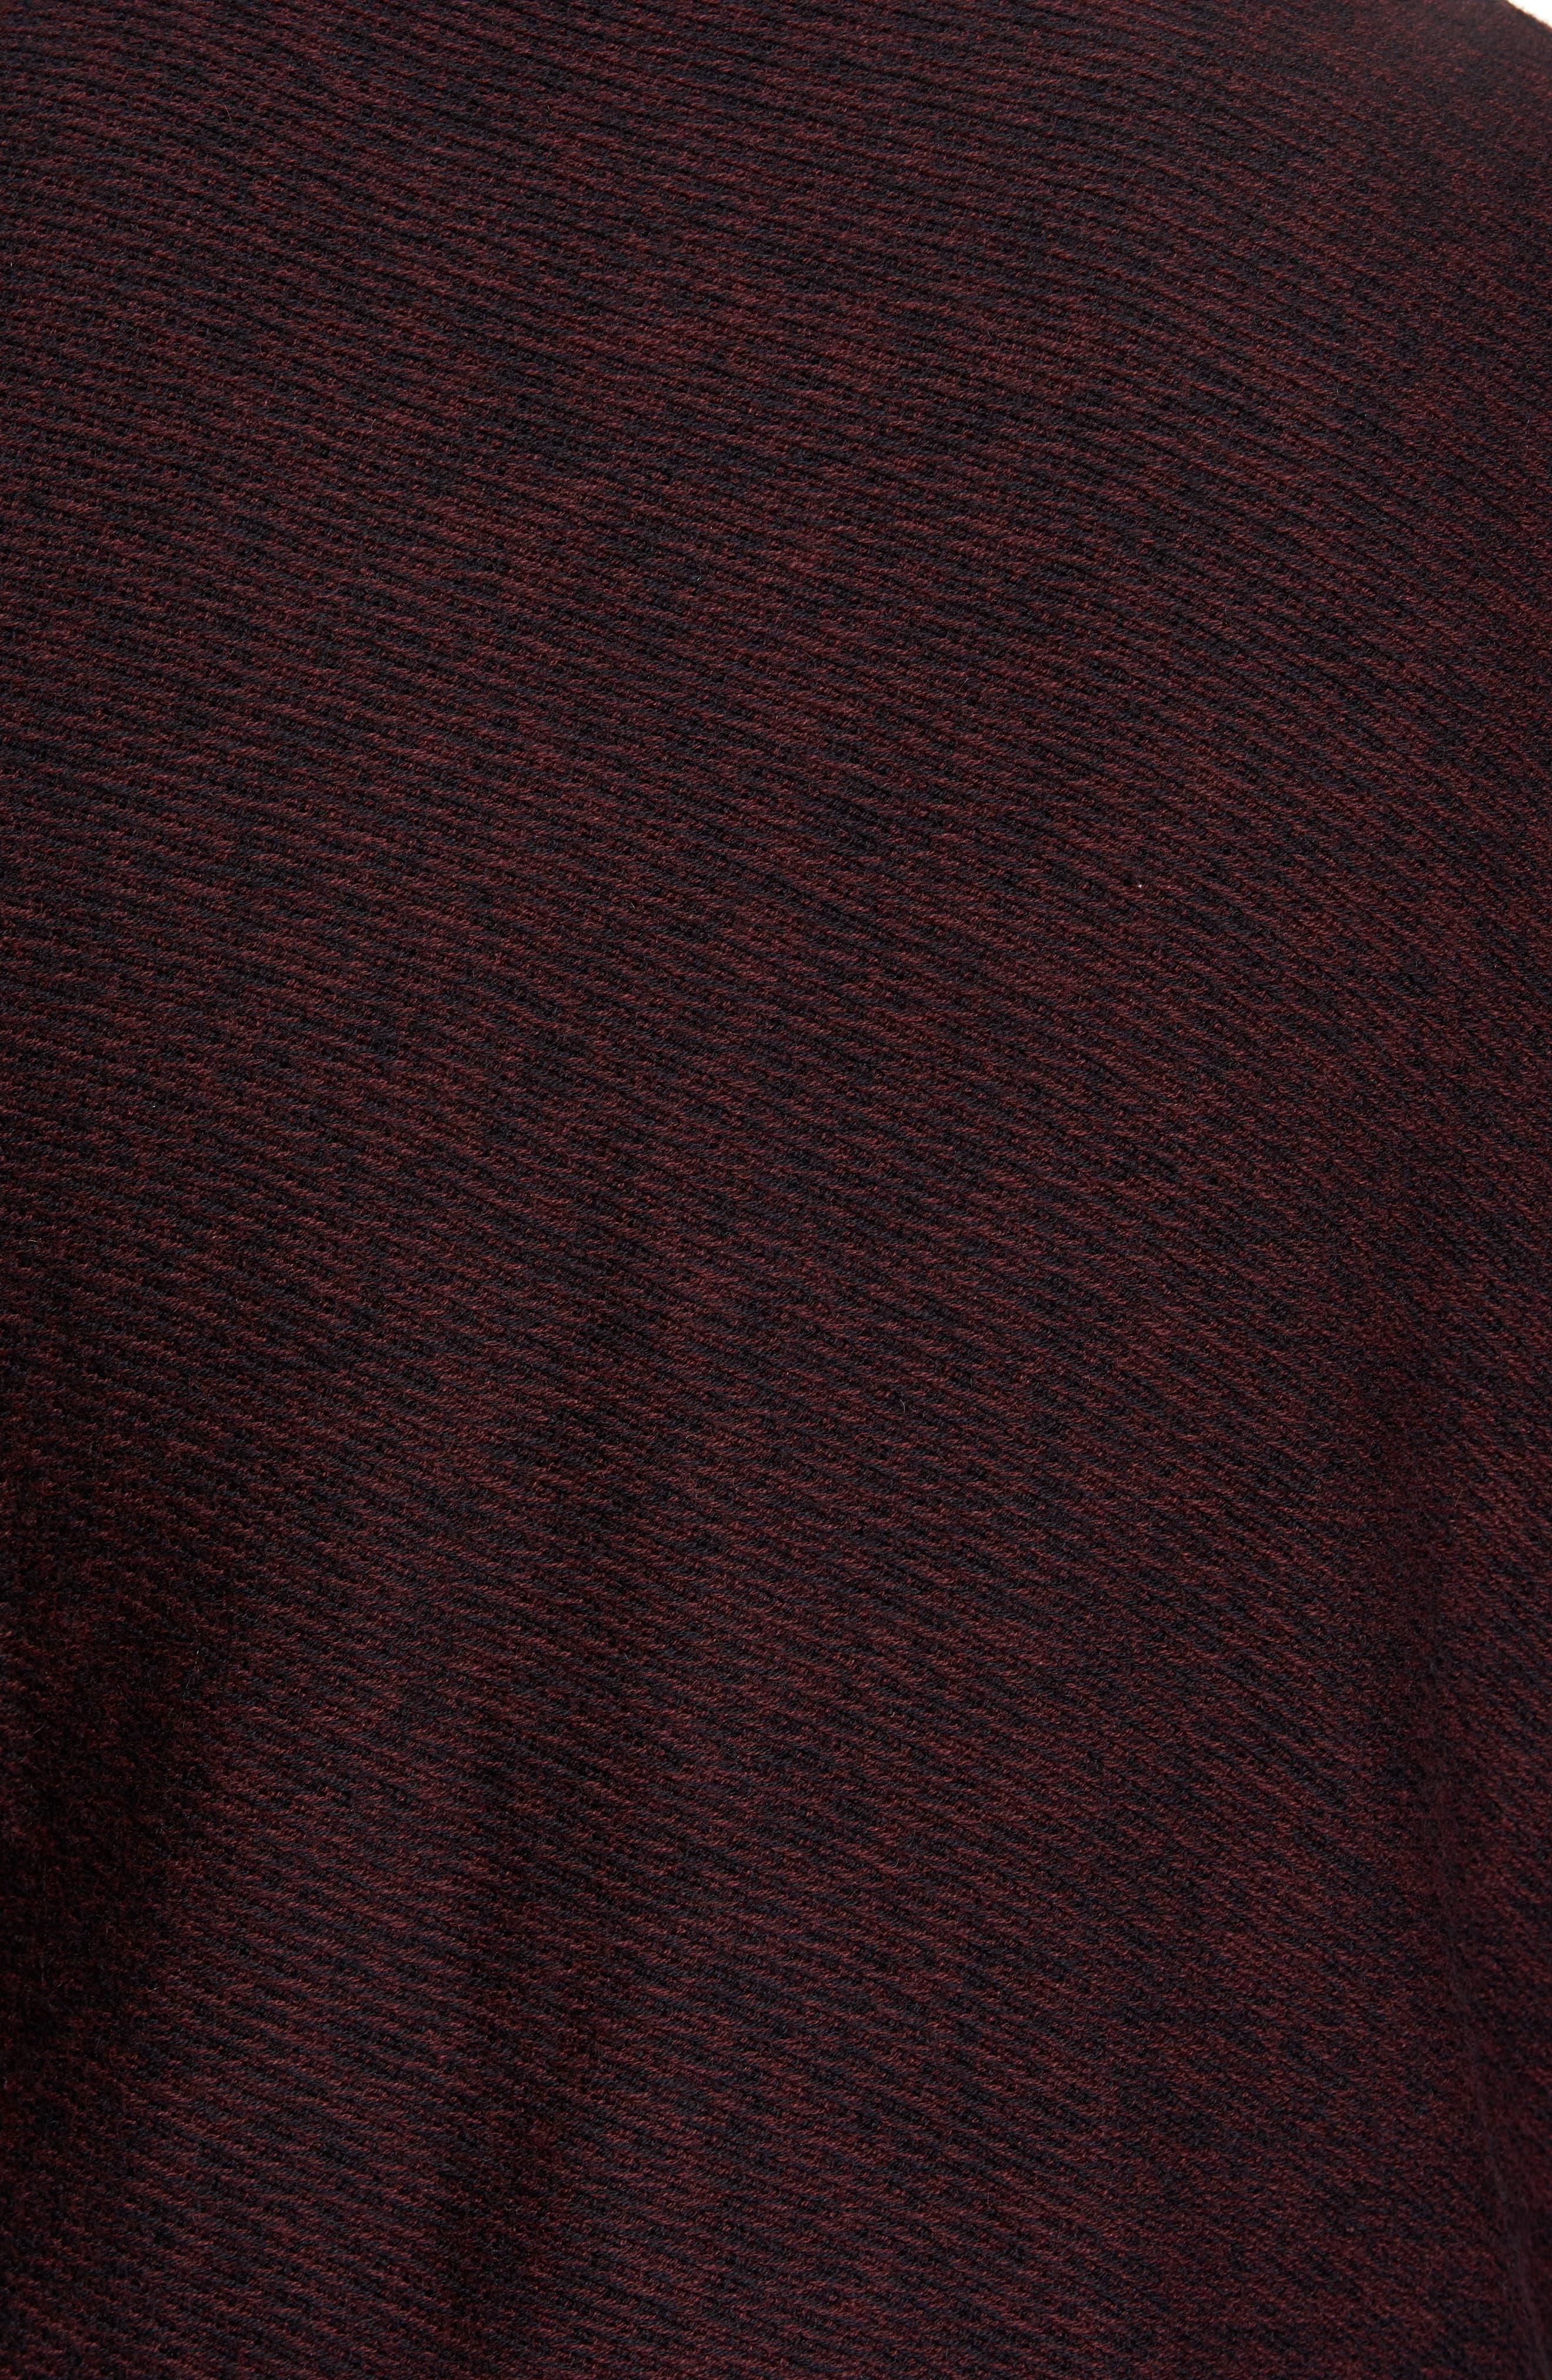 Cotton & Cashmere V-Neck Sweater,                             Alternate thumbnail 10, color,